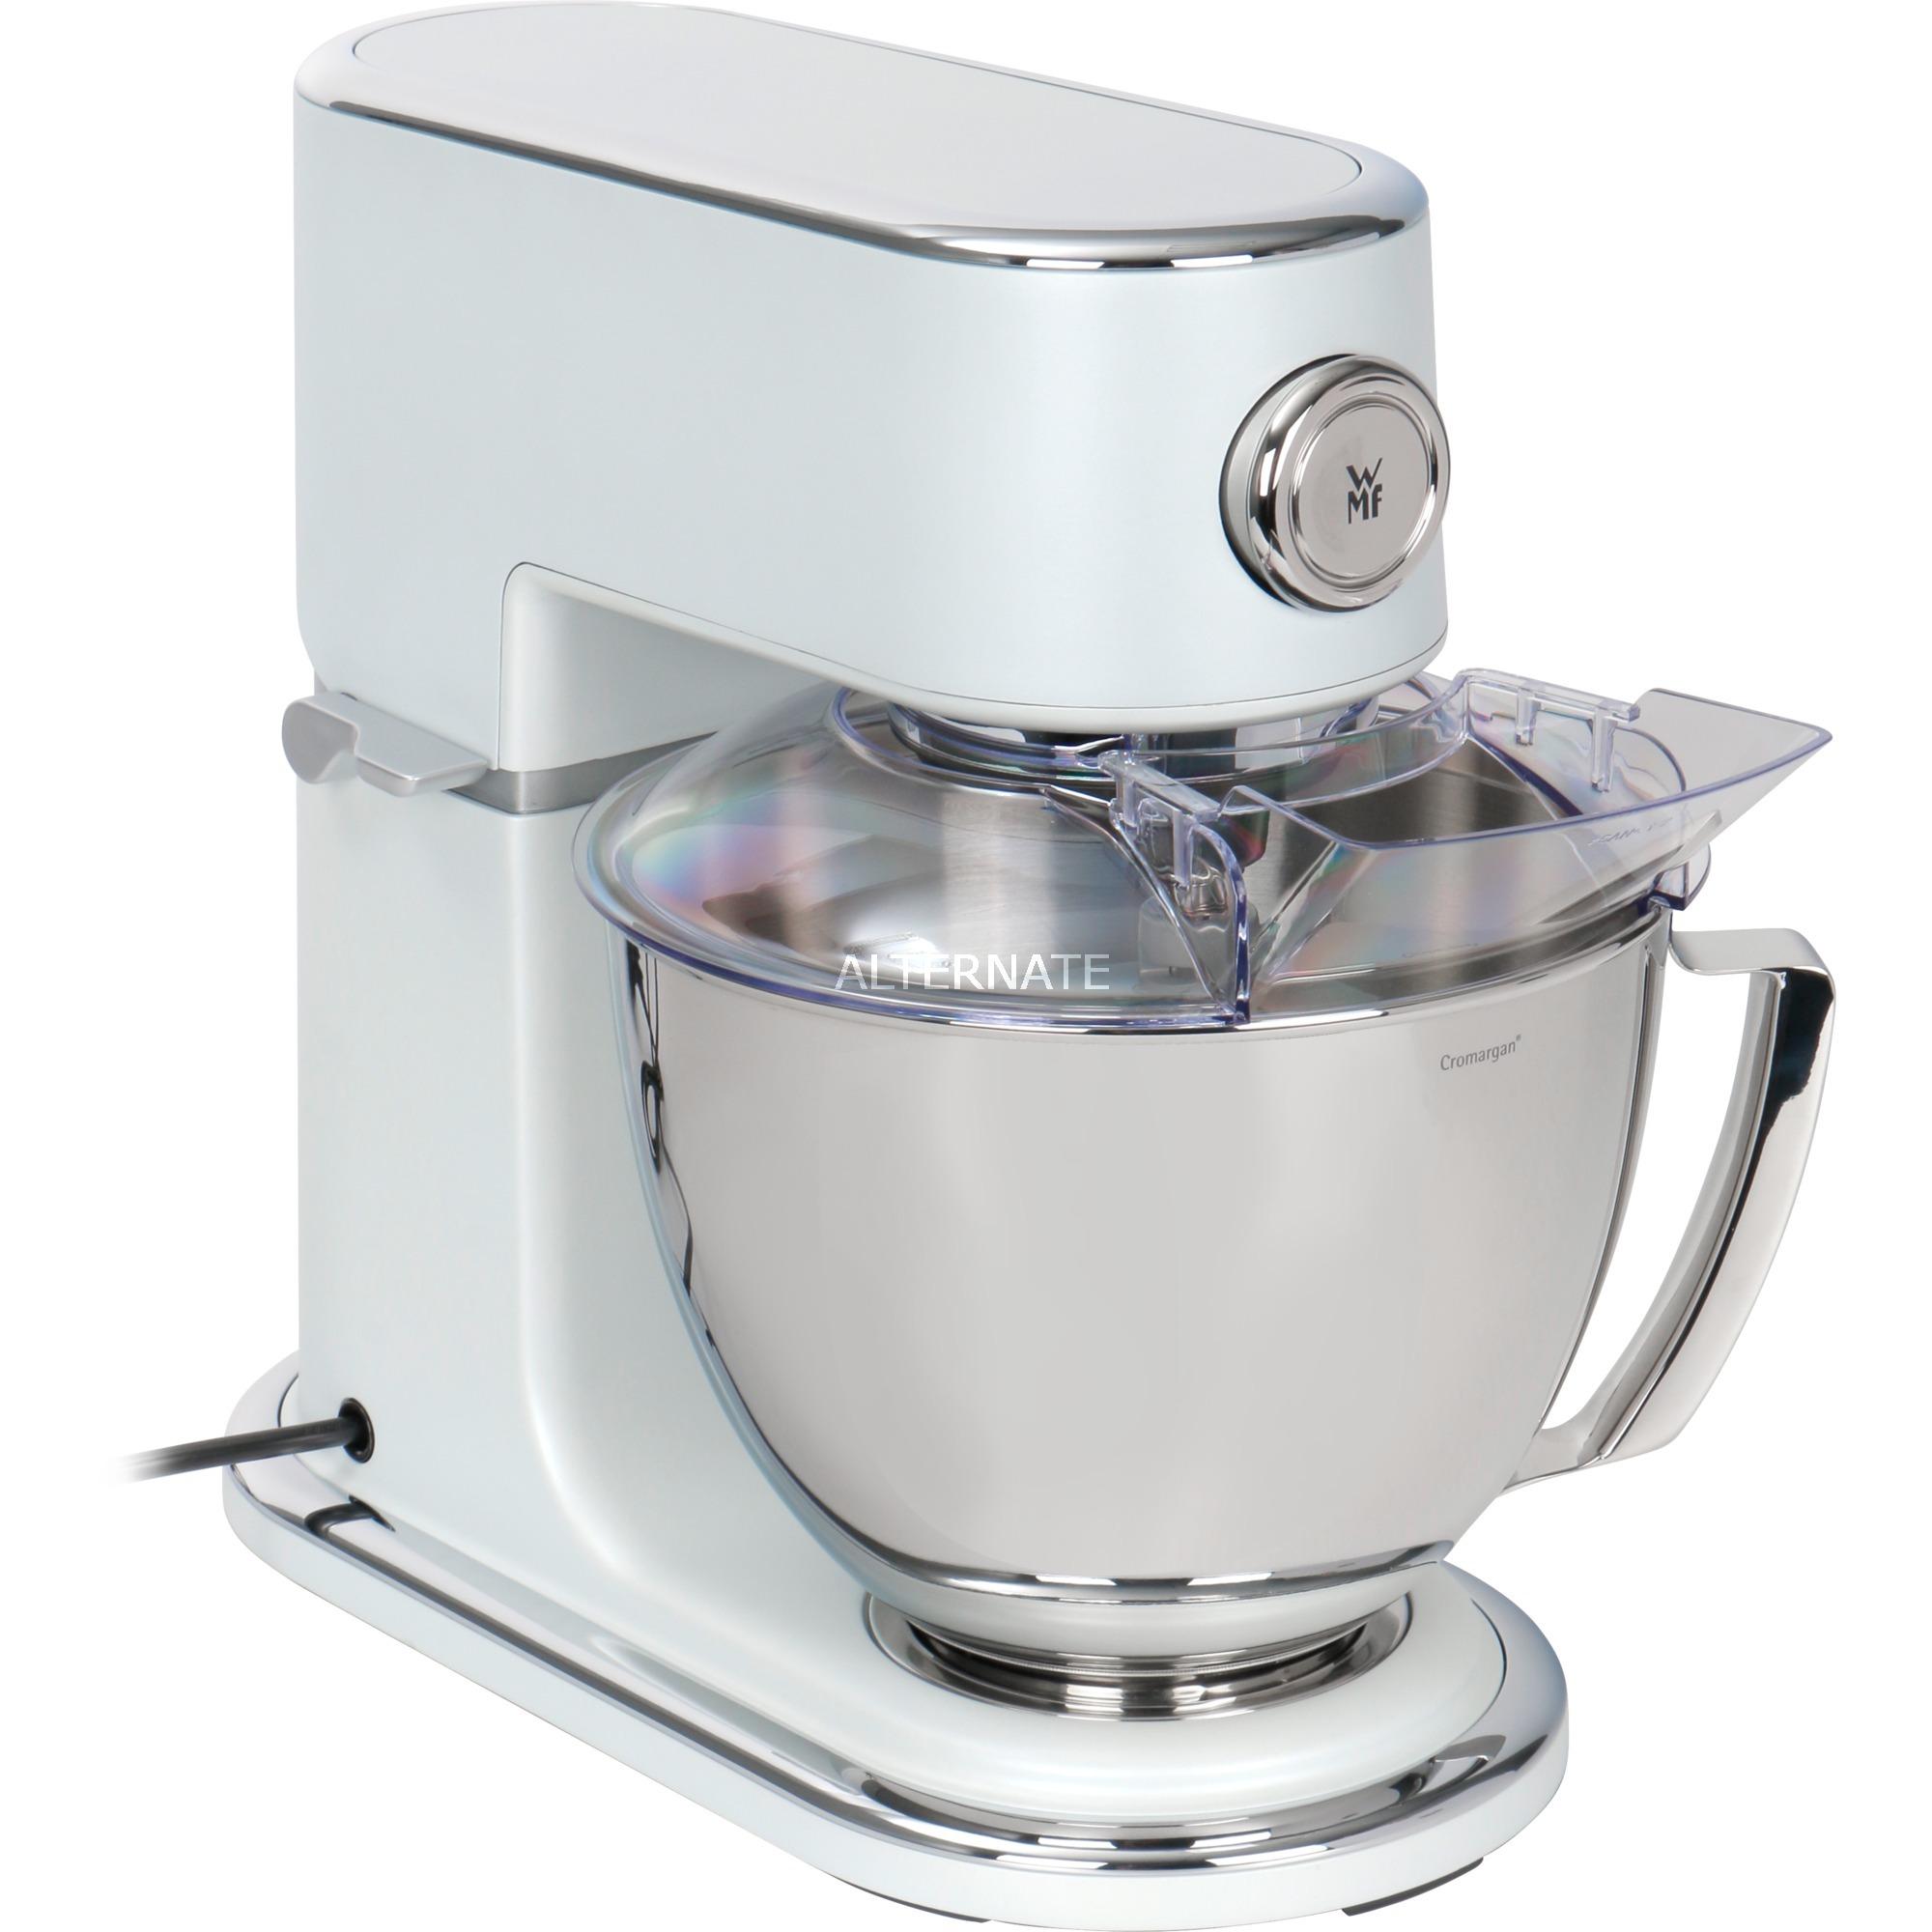 04 1632 0001 1000W 5L Blanco robot de cocina